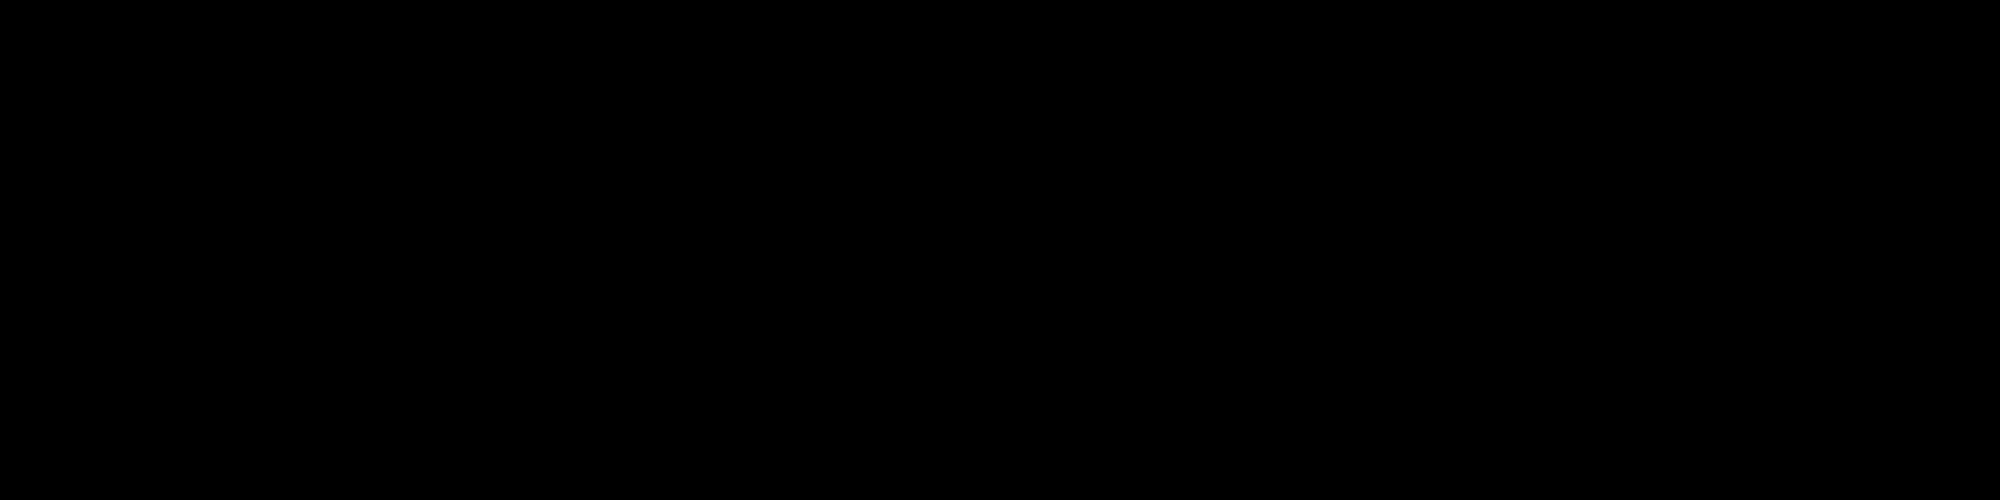 Square Logo - PredictSpring mPOS Partner